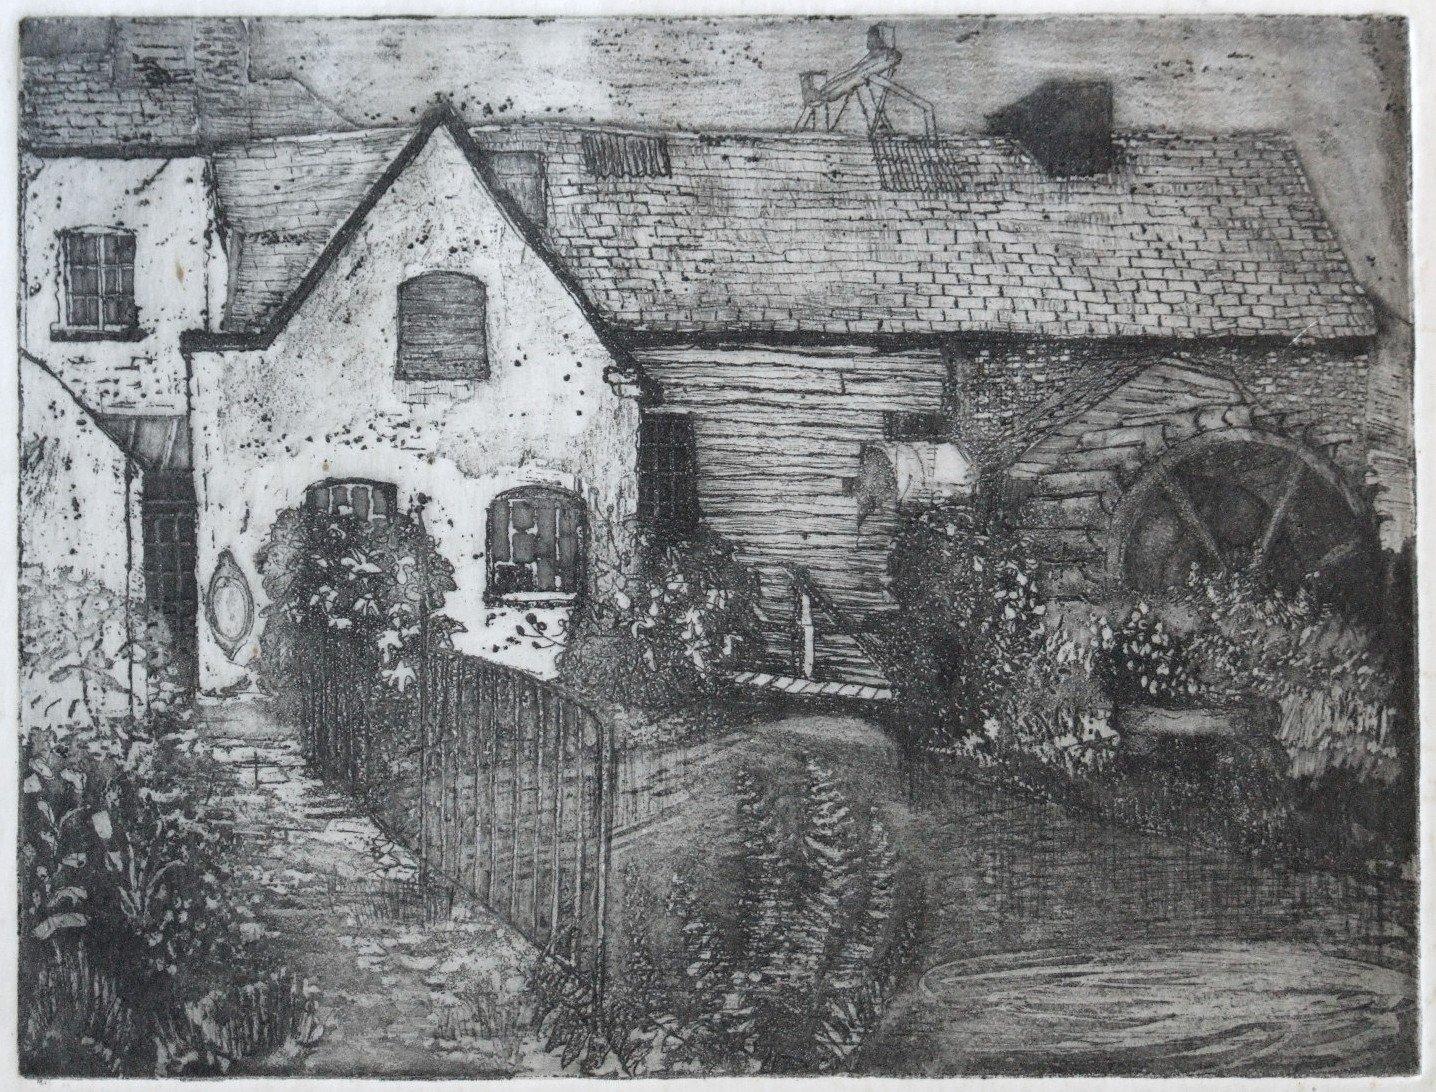 Pann Mill, by Lorna Cassidy